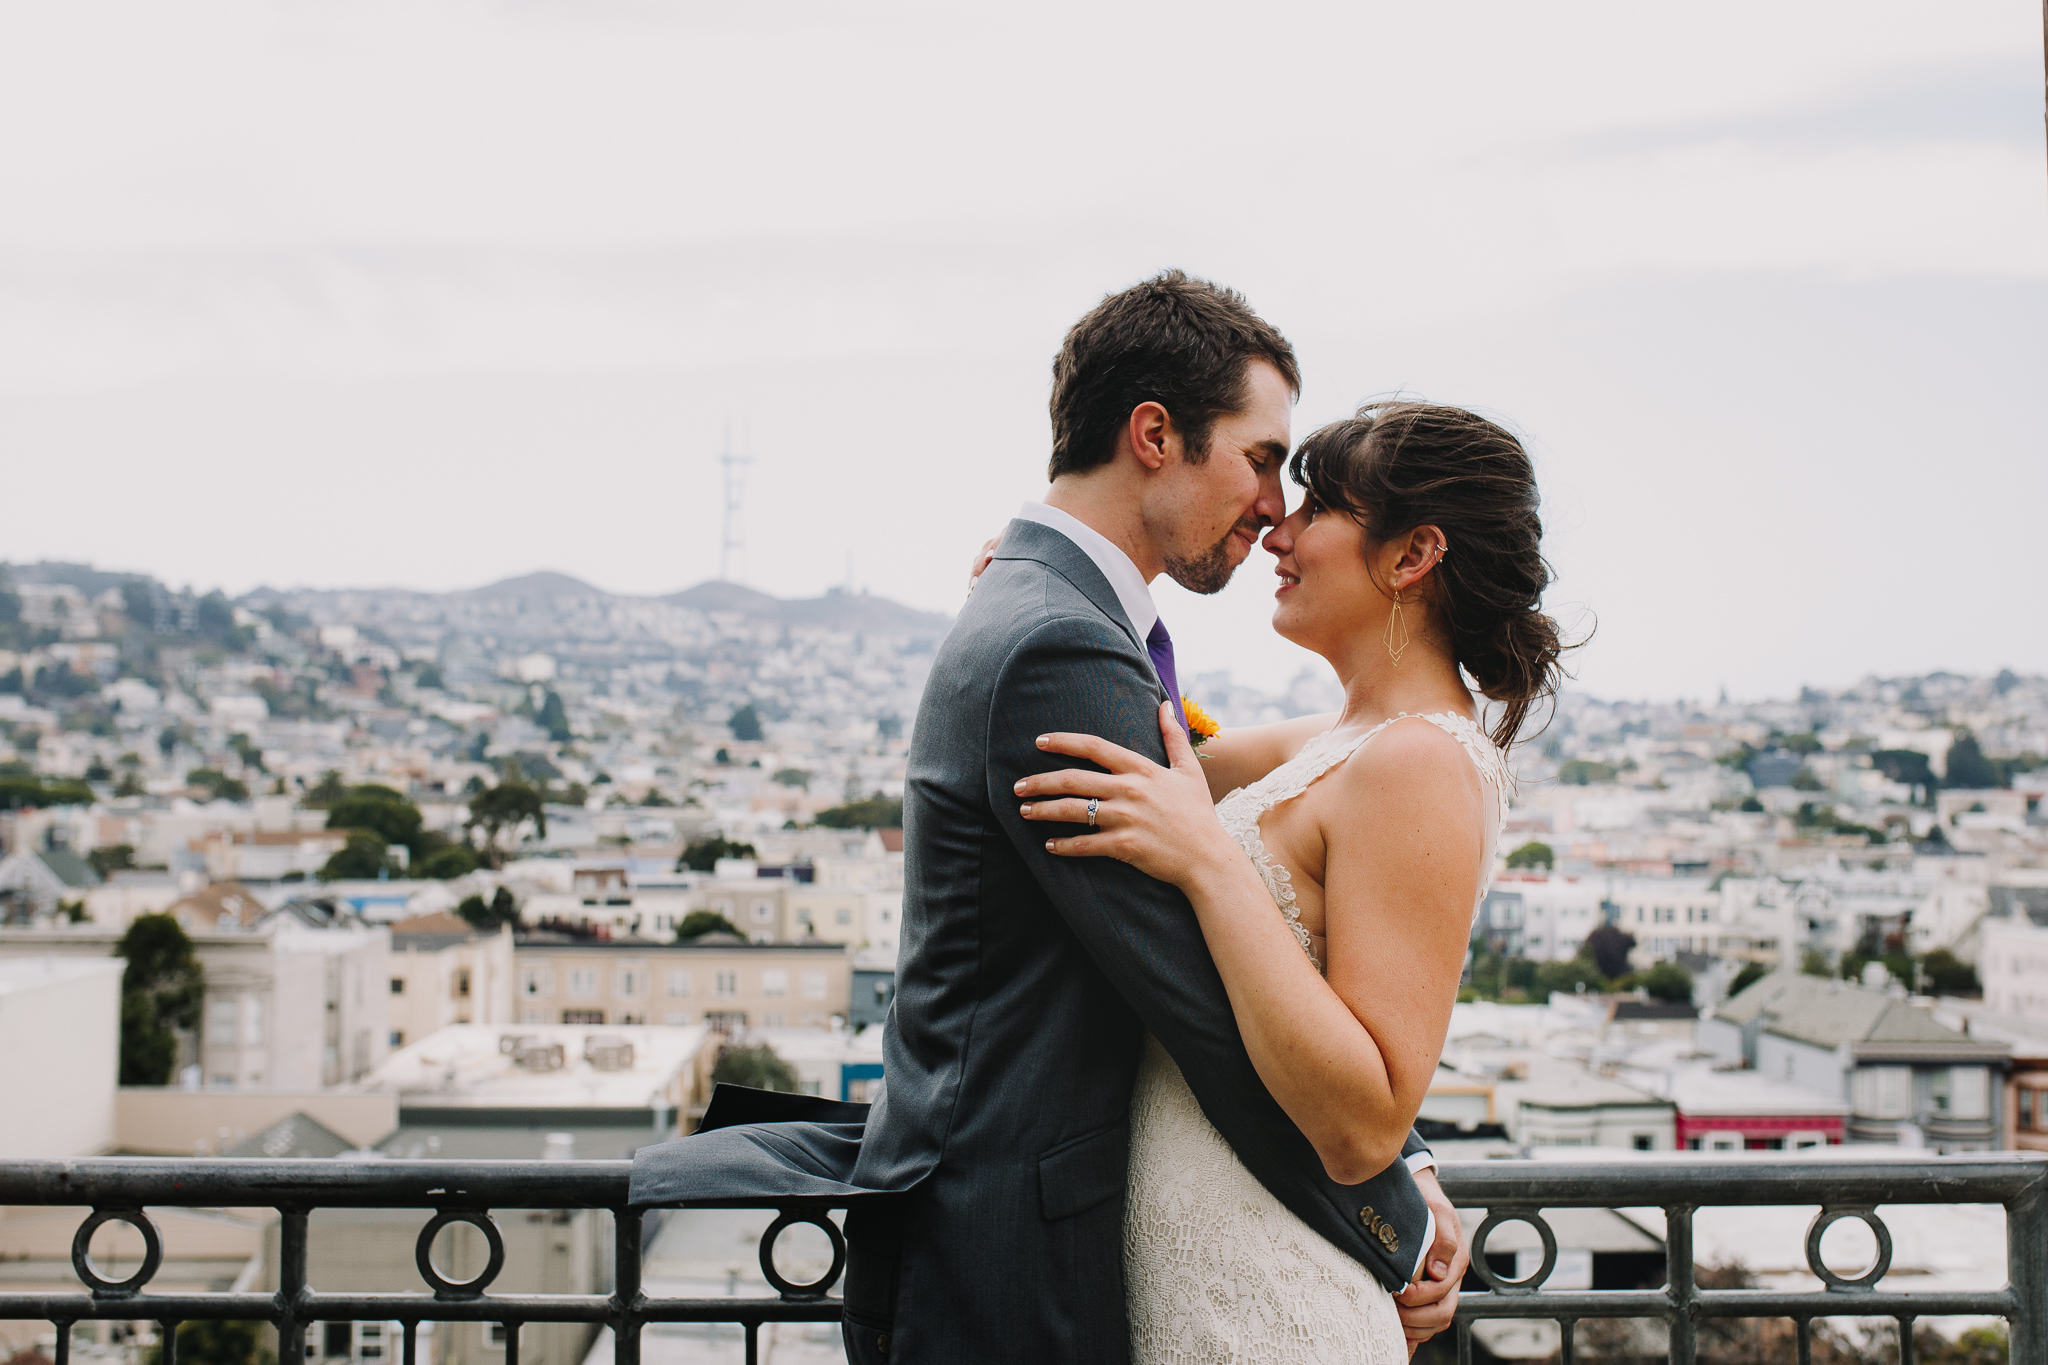 Archer Inspired Photography San Francisco Bay Area Wedding Lifestyle Documentary City Bar Photographer-22.jpg